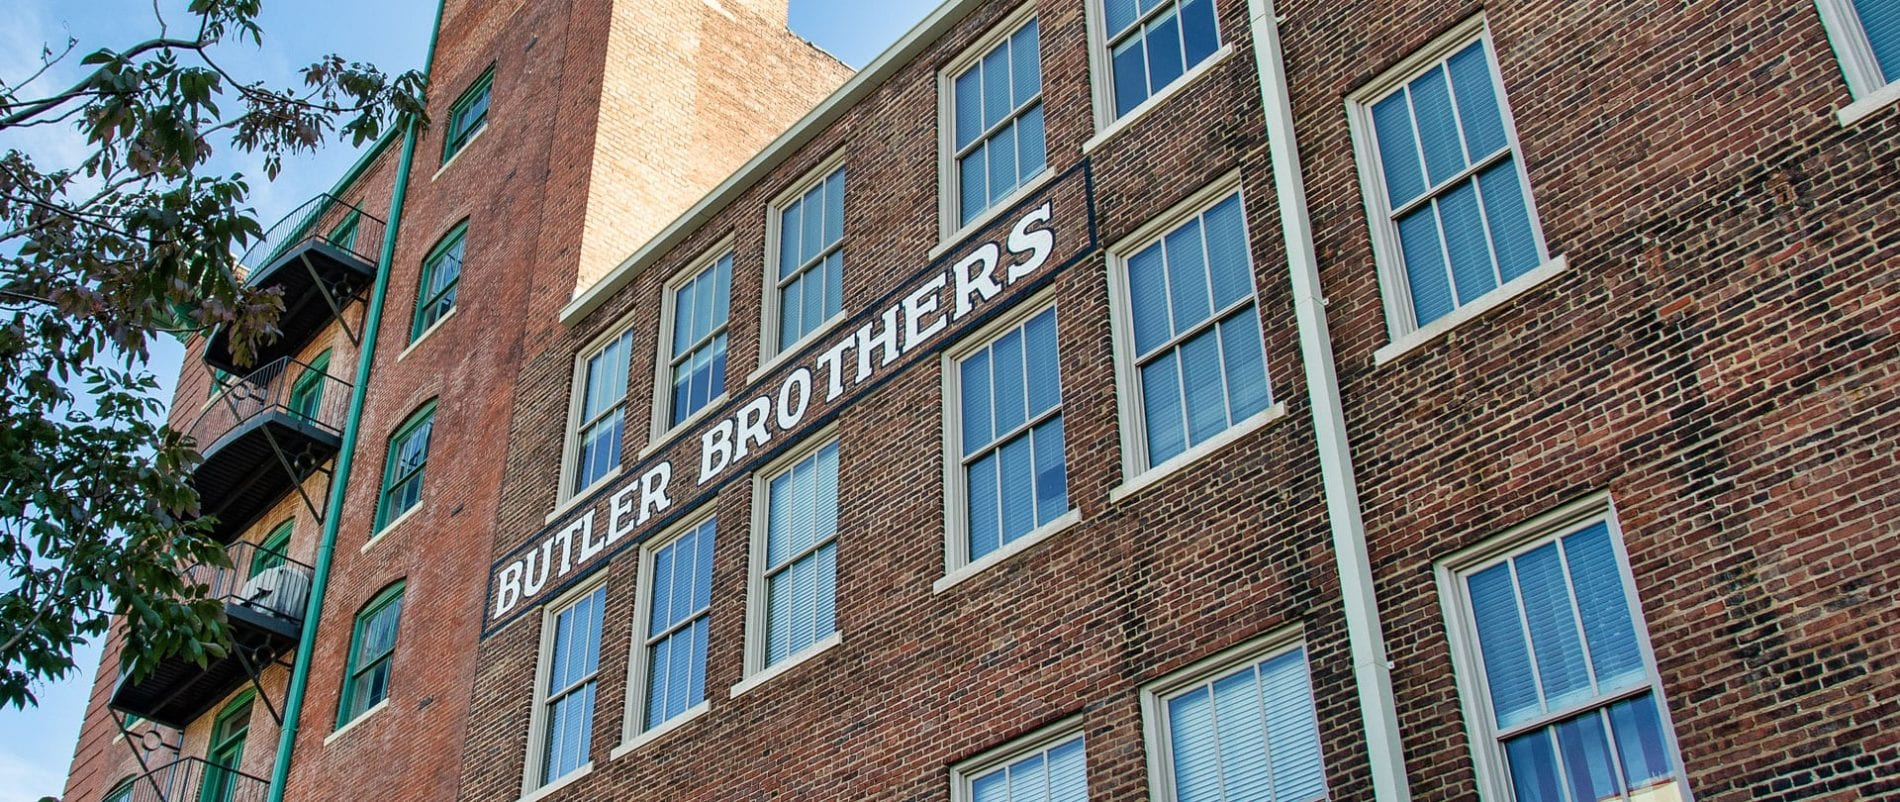 Butler Brothers – Hardwood Floors!